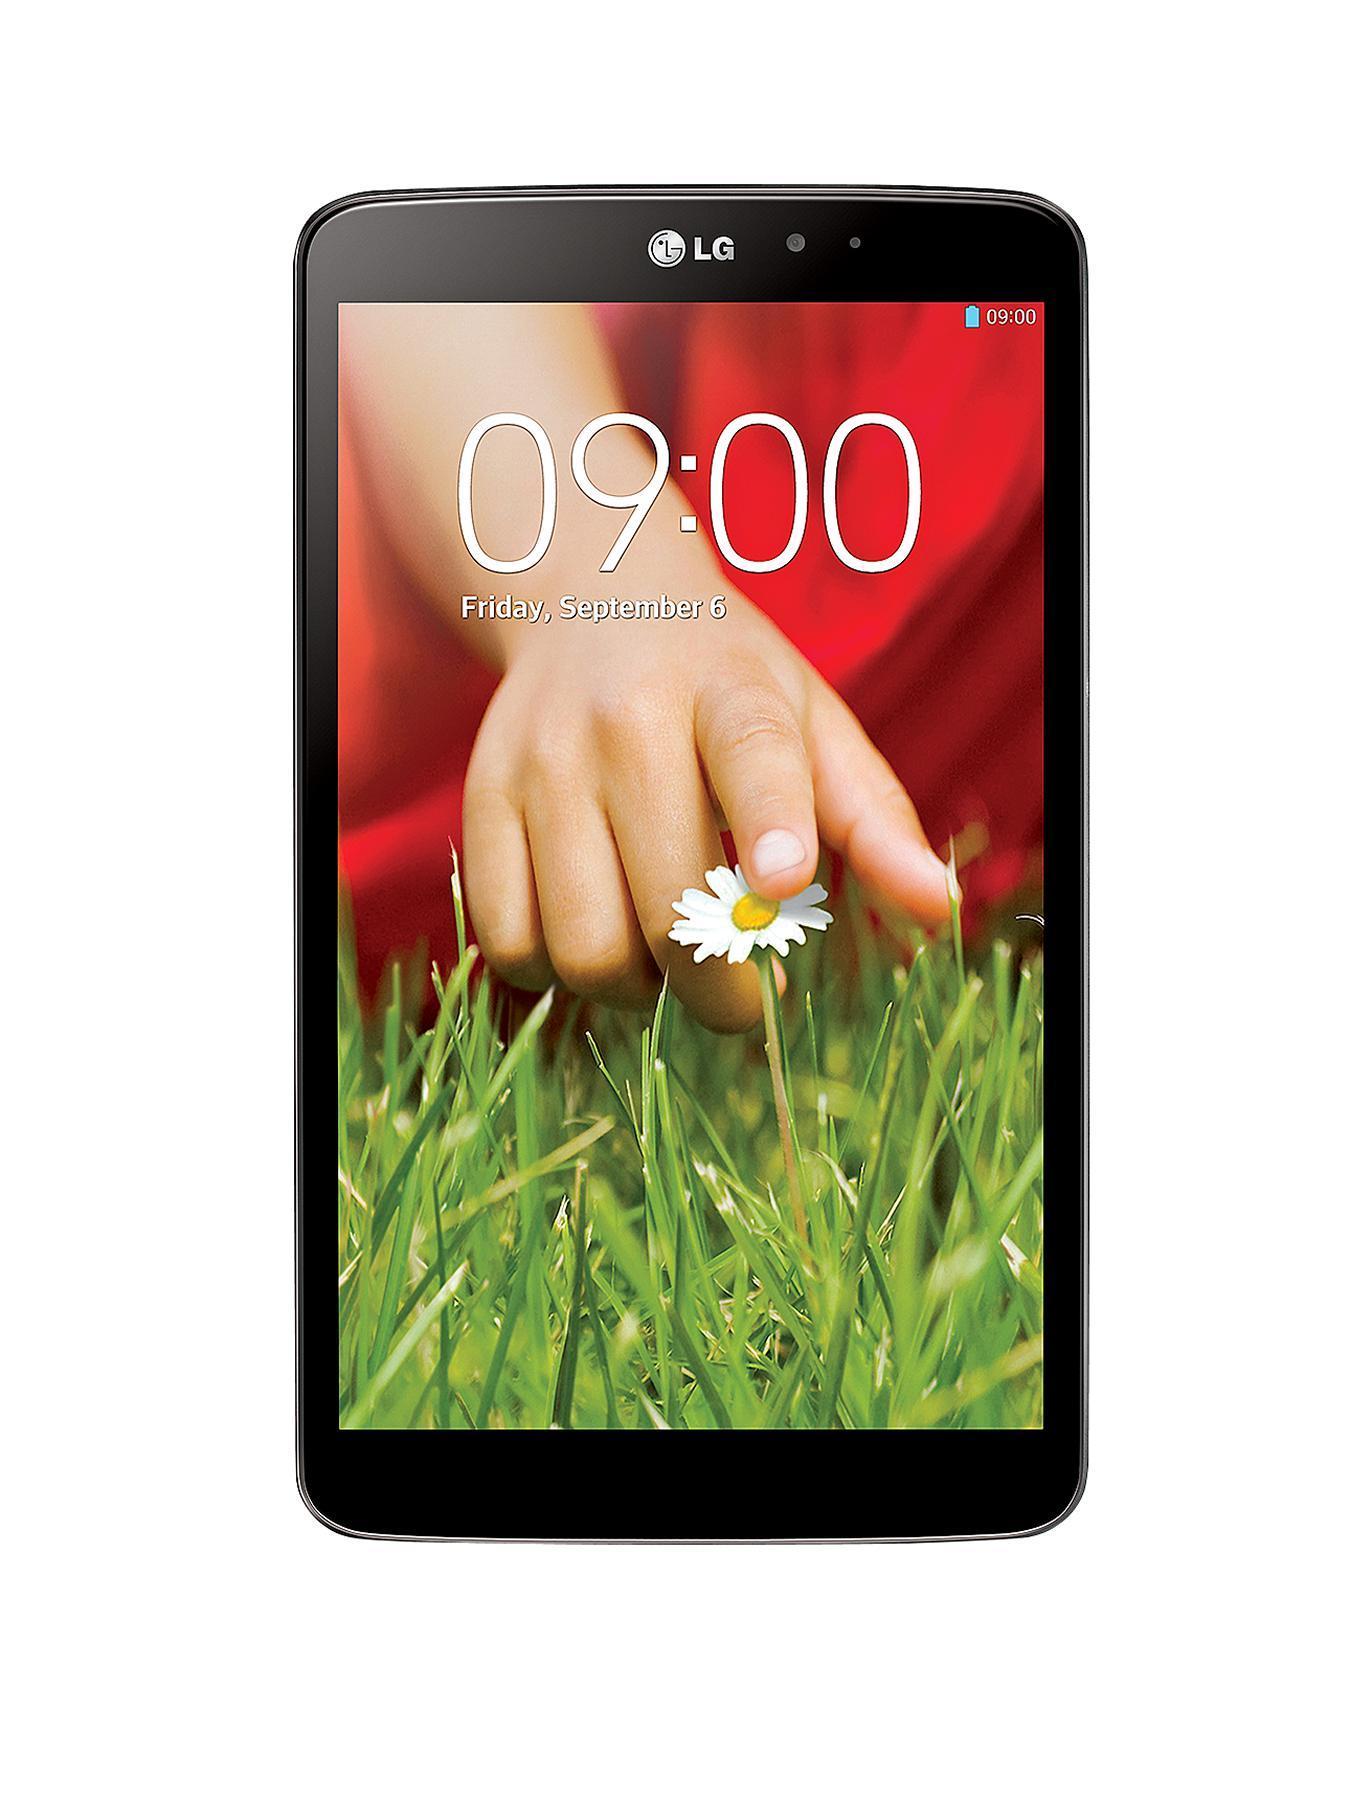 LG G Pad 8-inch Tablet